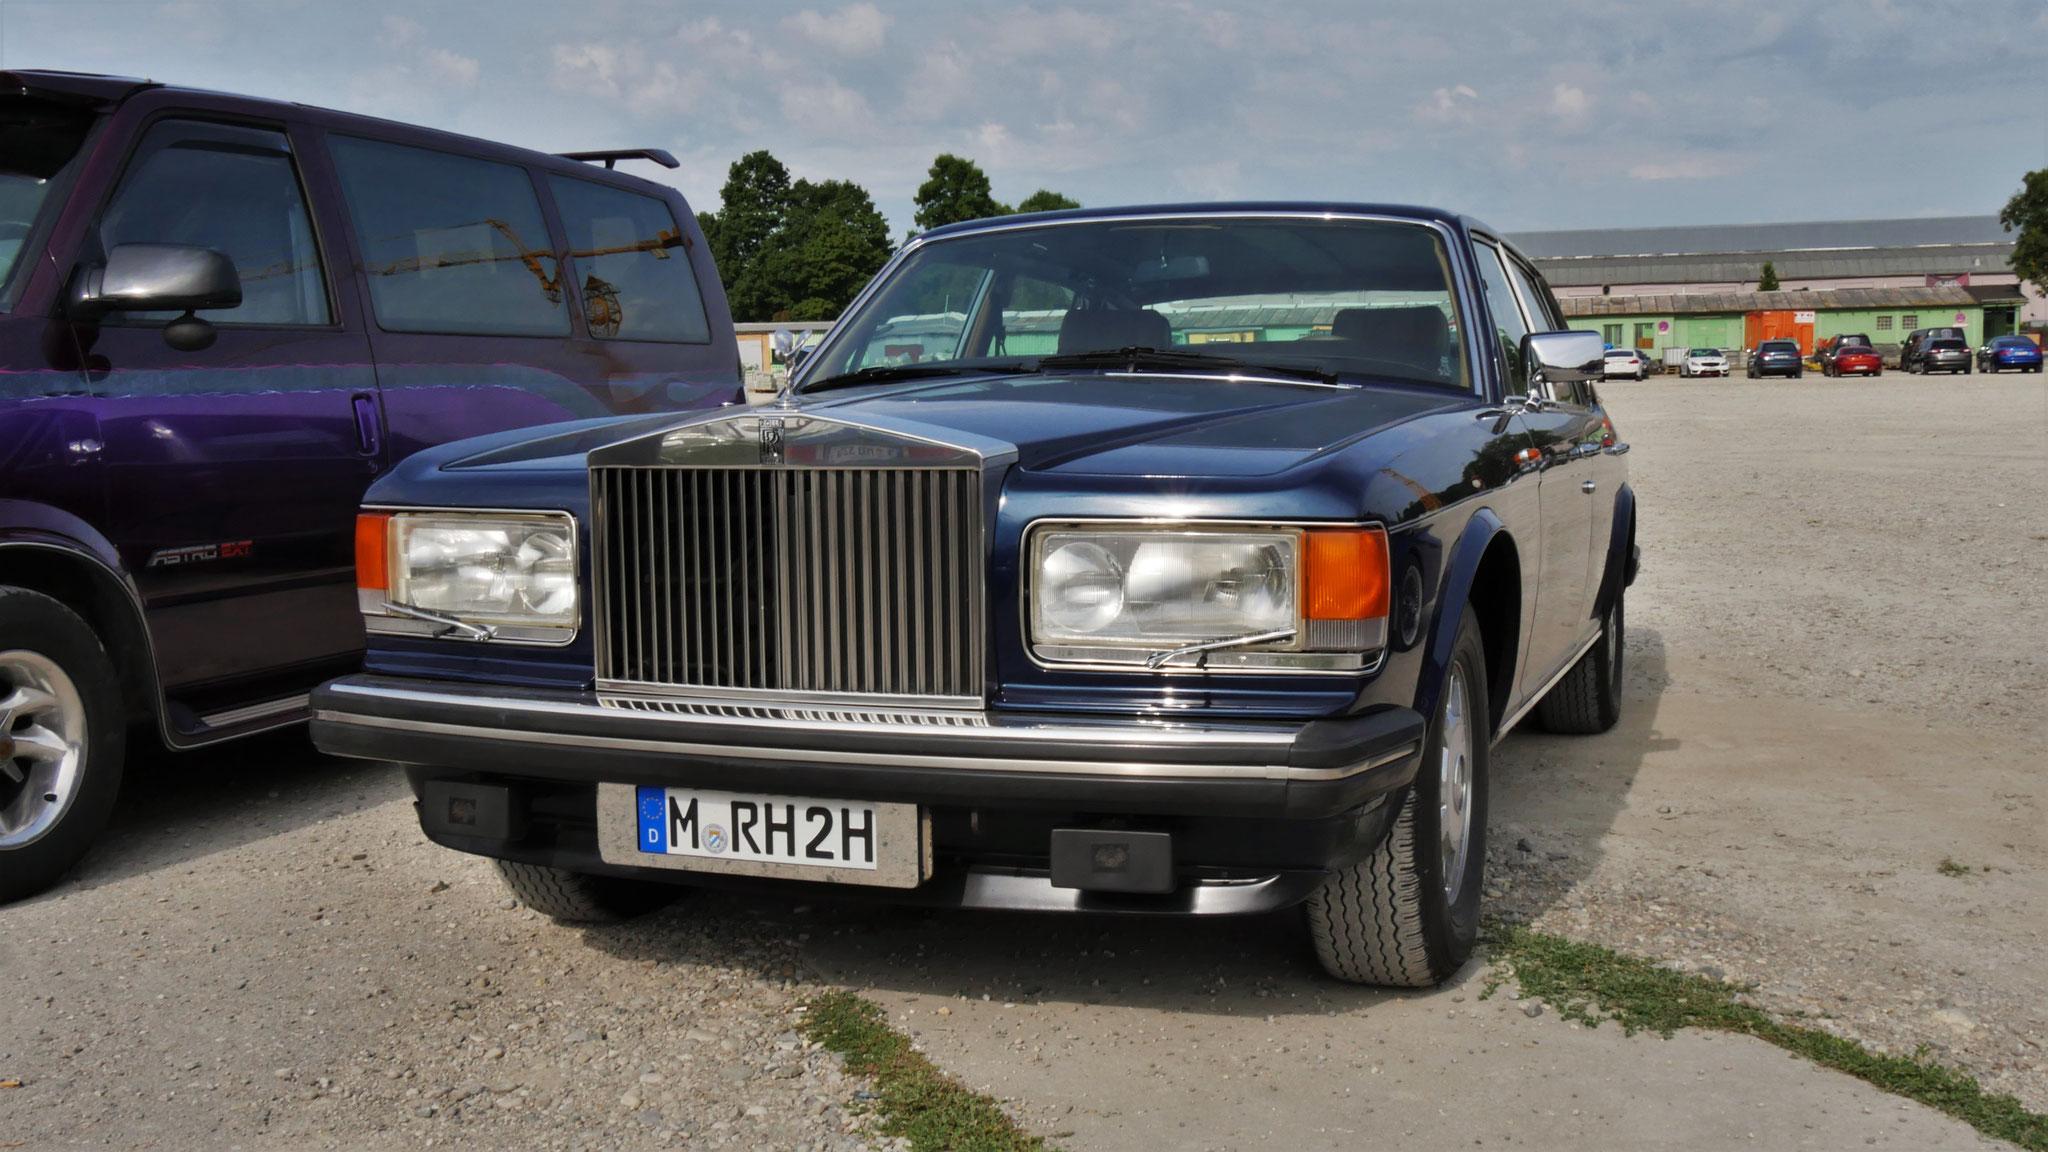 Rolls Royce Silver Spirit - M-RH-2H